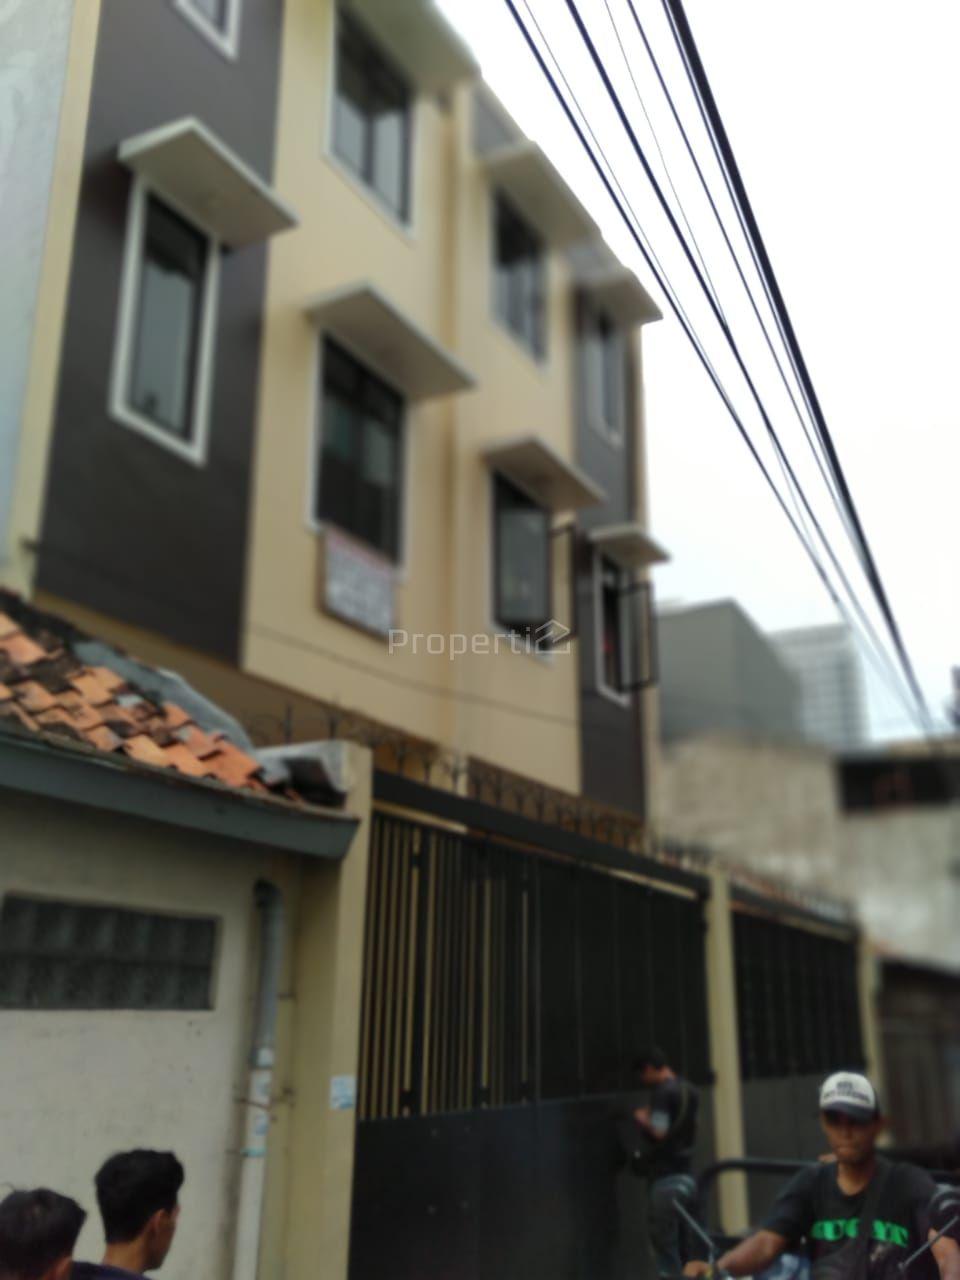 New Shophouse in Tamansari Business Area, West Jakarta, DKI Jakarta